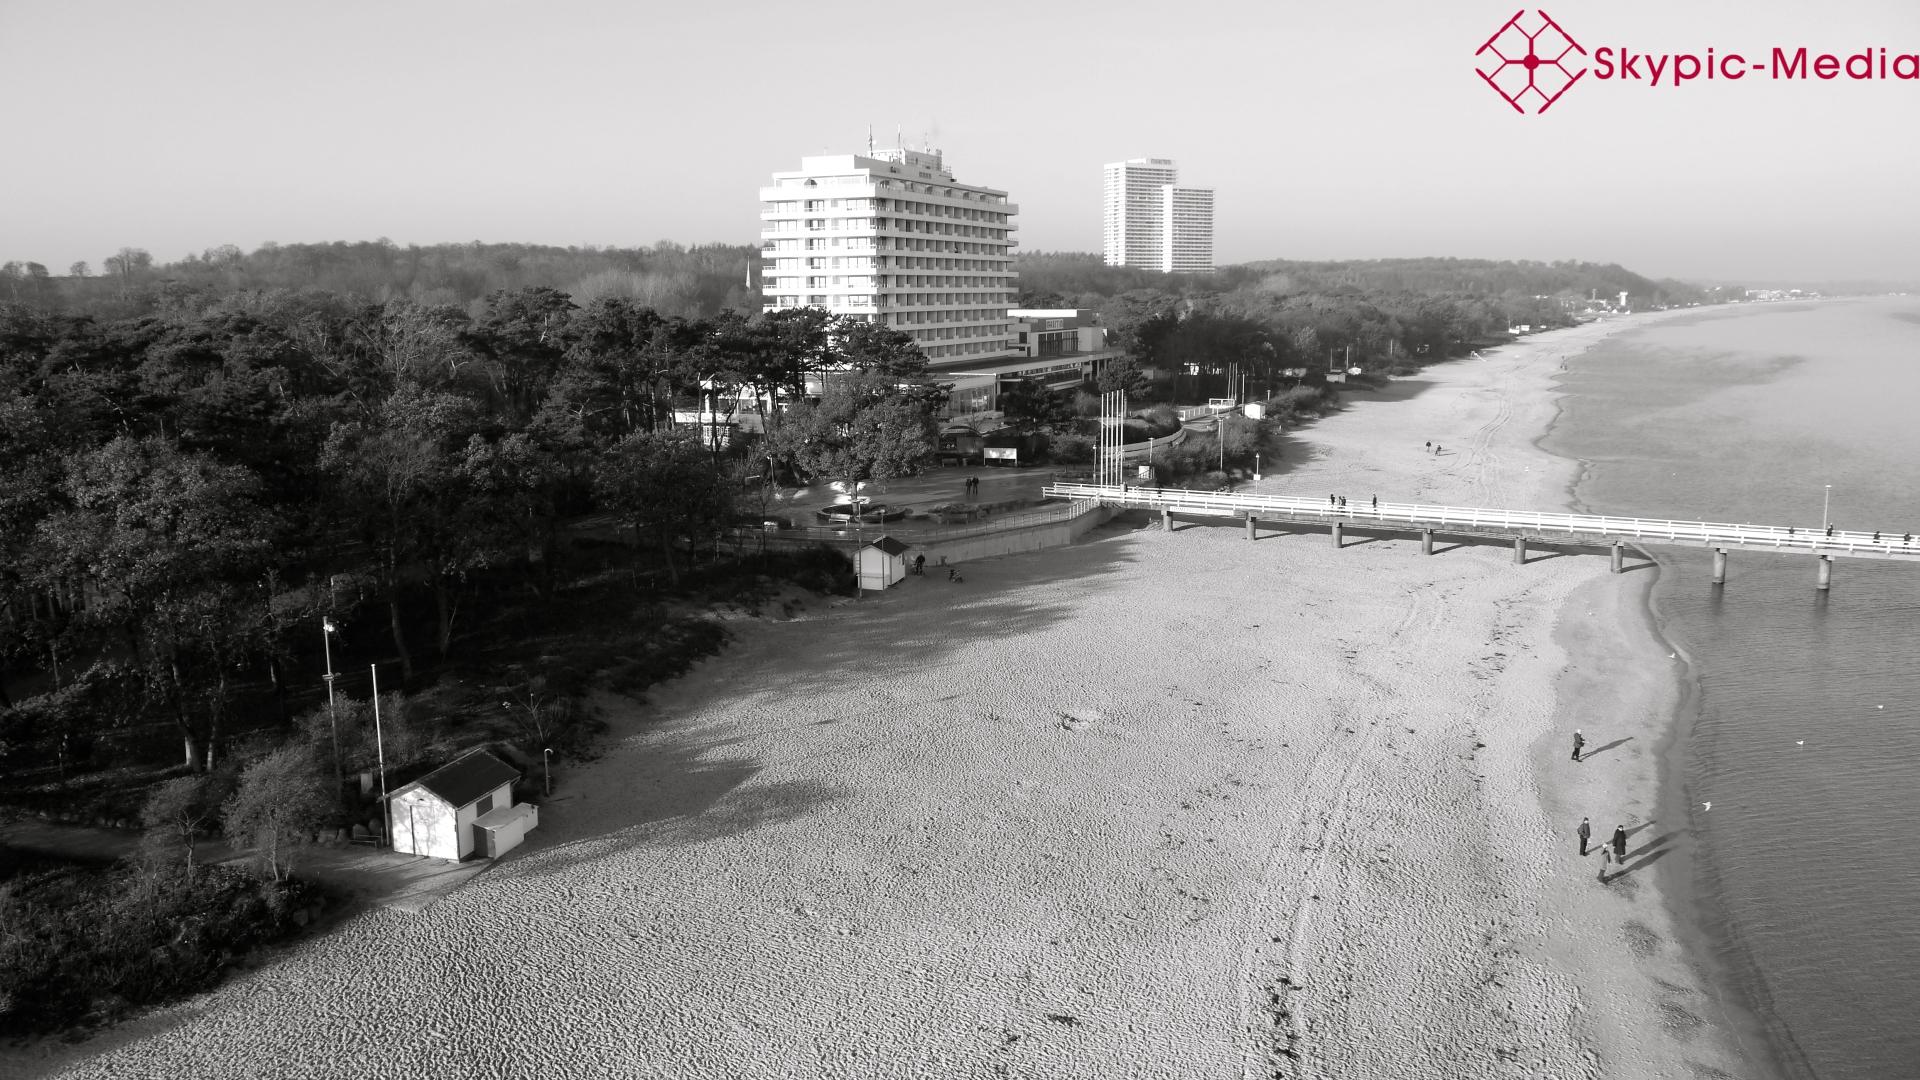 Luftbild vom Strand